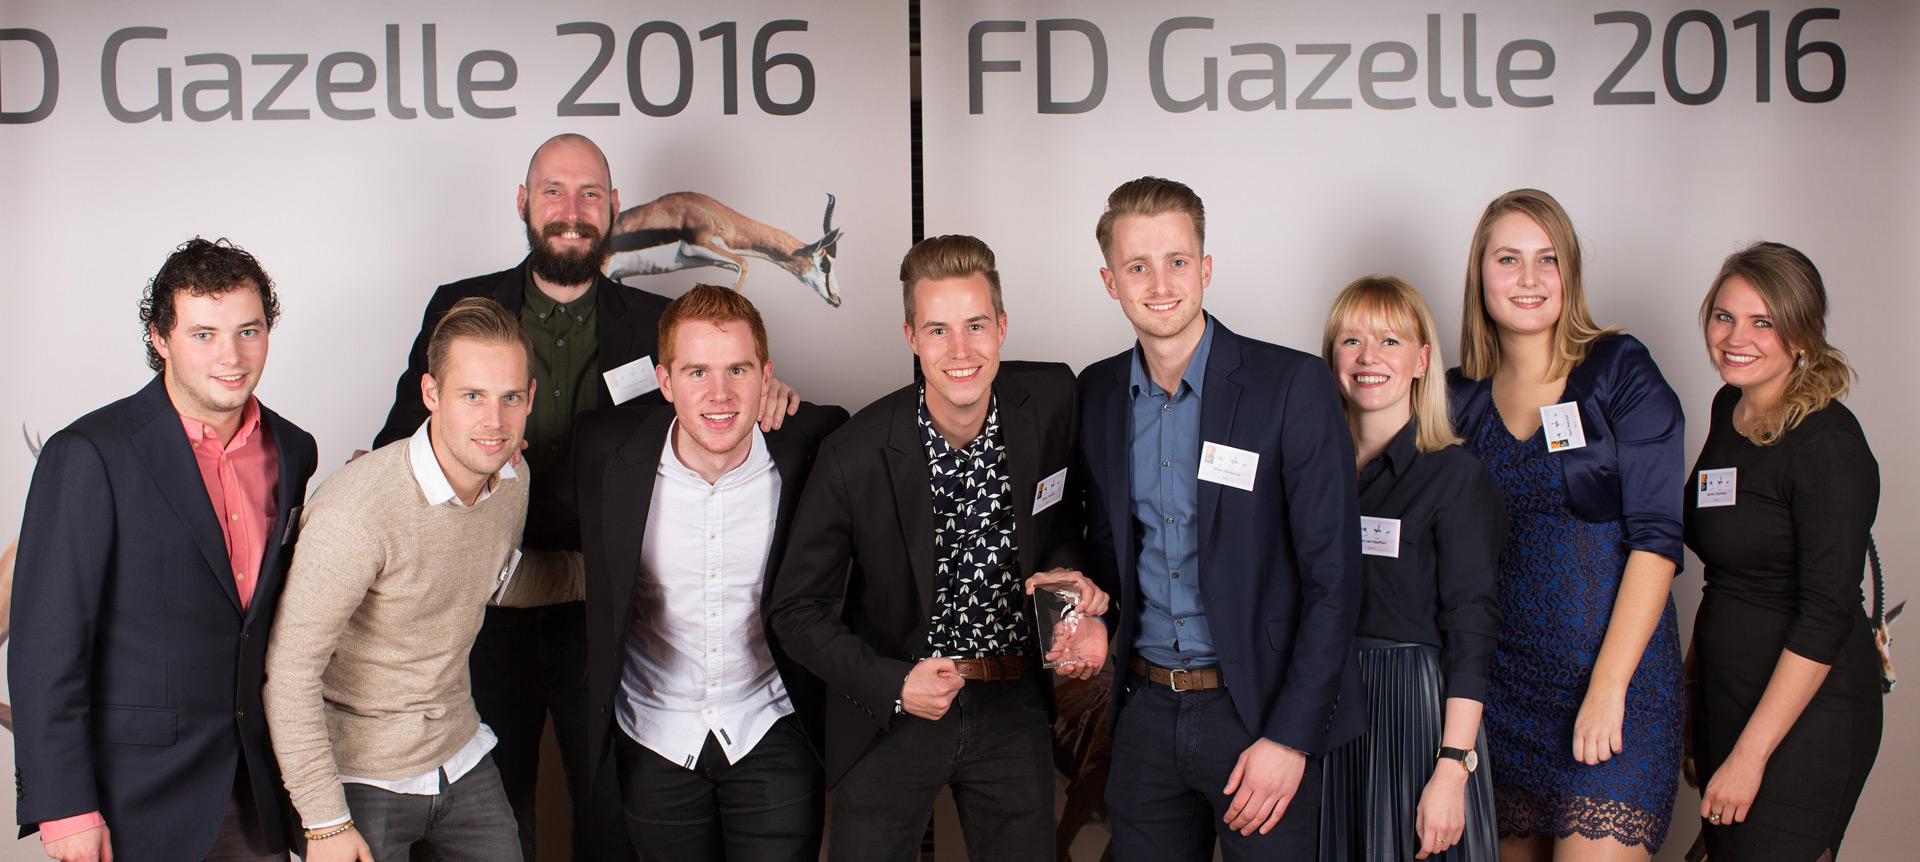 FD Gazellen uitreiking 2016